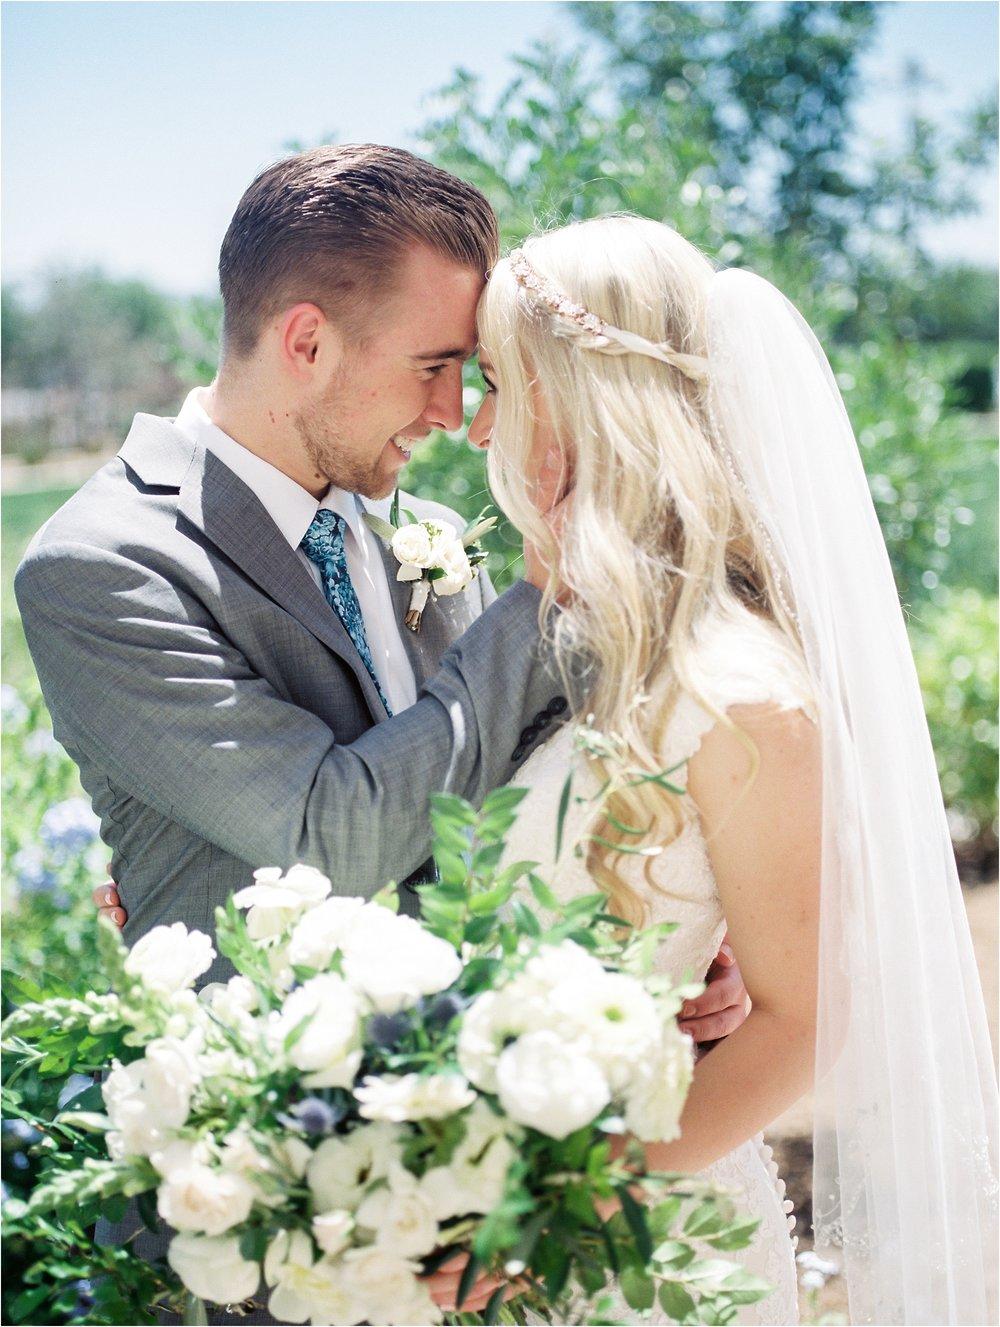 Sarah Jane Photography Film Hybrid Scottsdale Phoenix Arizona Destination Wedding Photographer Julie ans Mason_0019.jpg